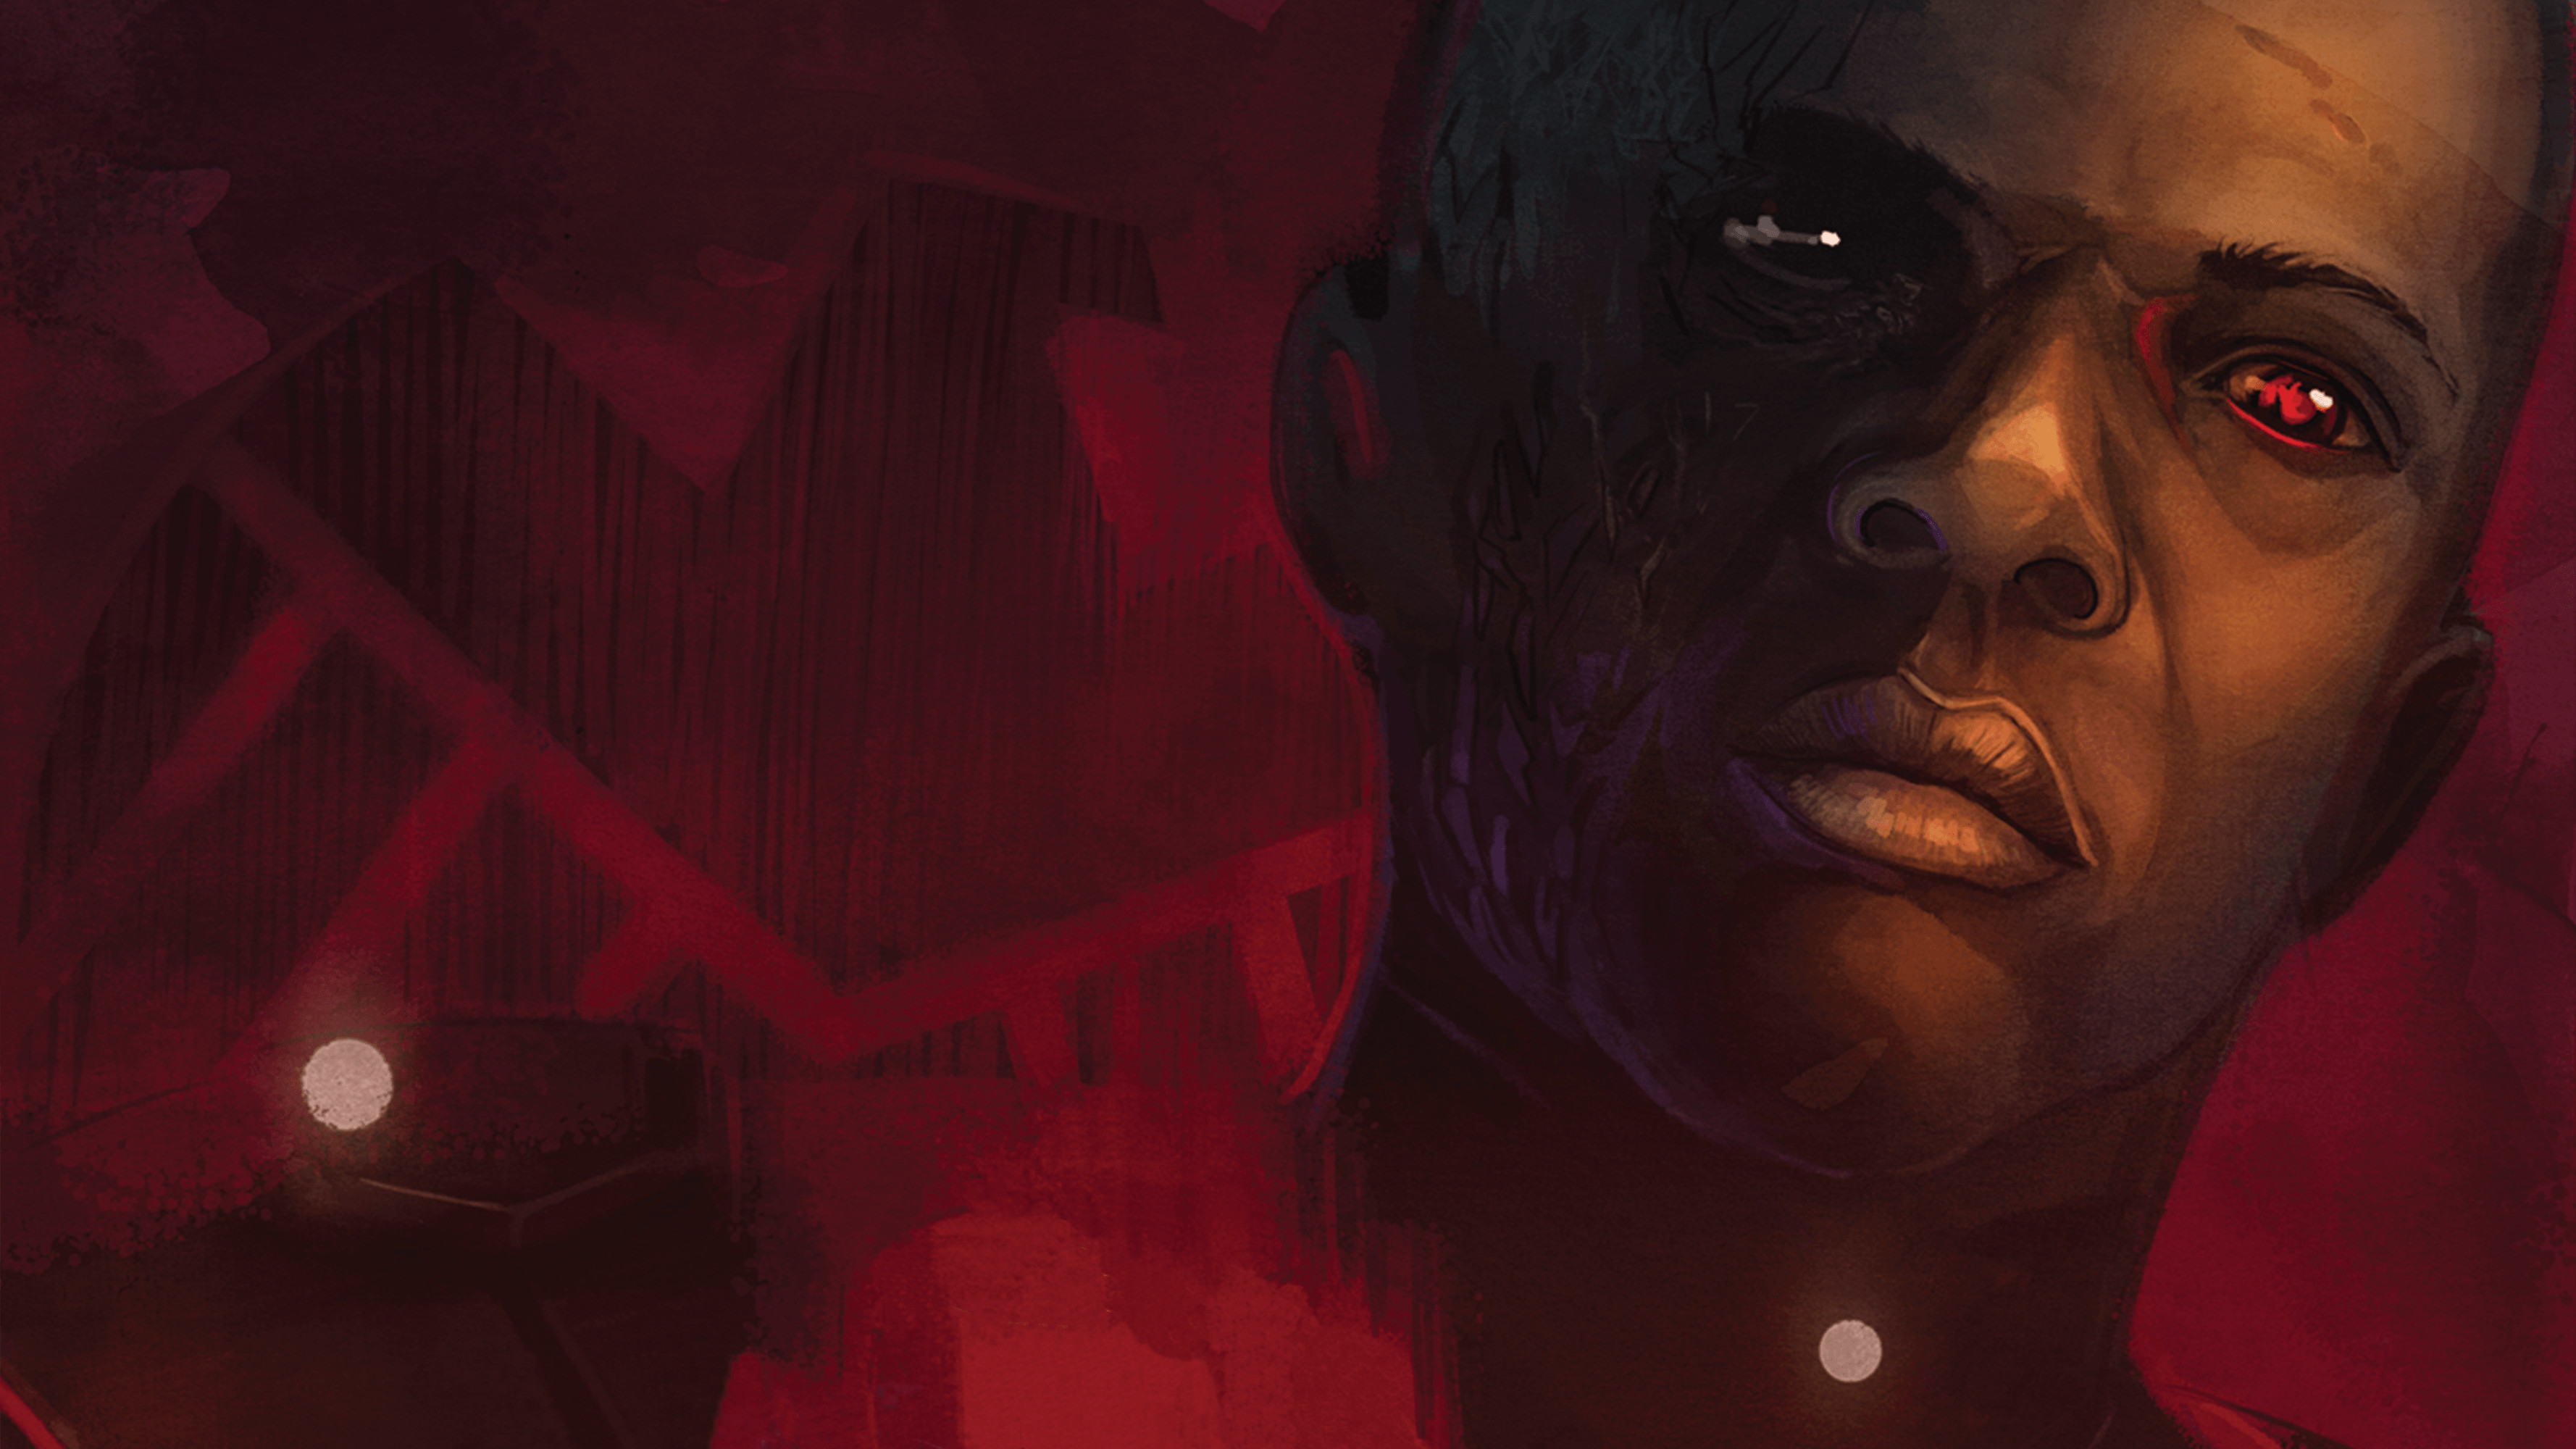 Agents Of S.H.I.E.L.D. Deathlok Marvel Cinematic Universe